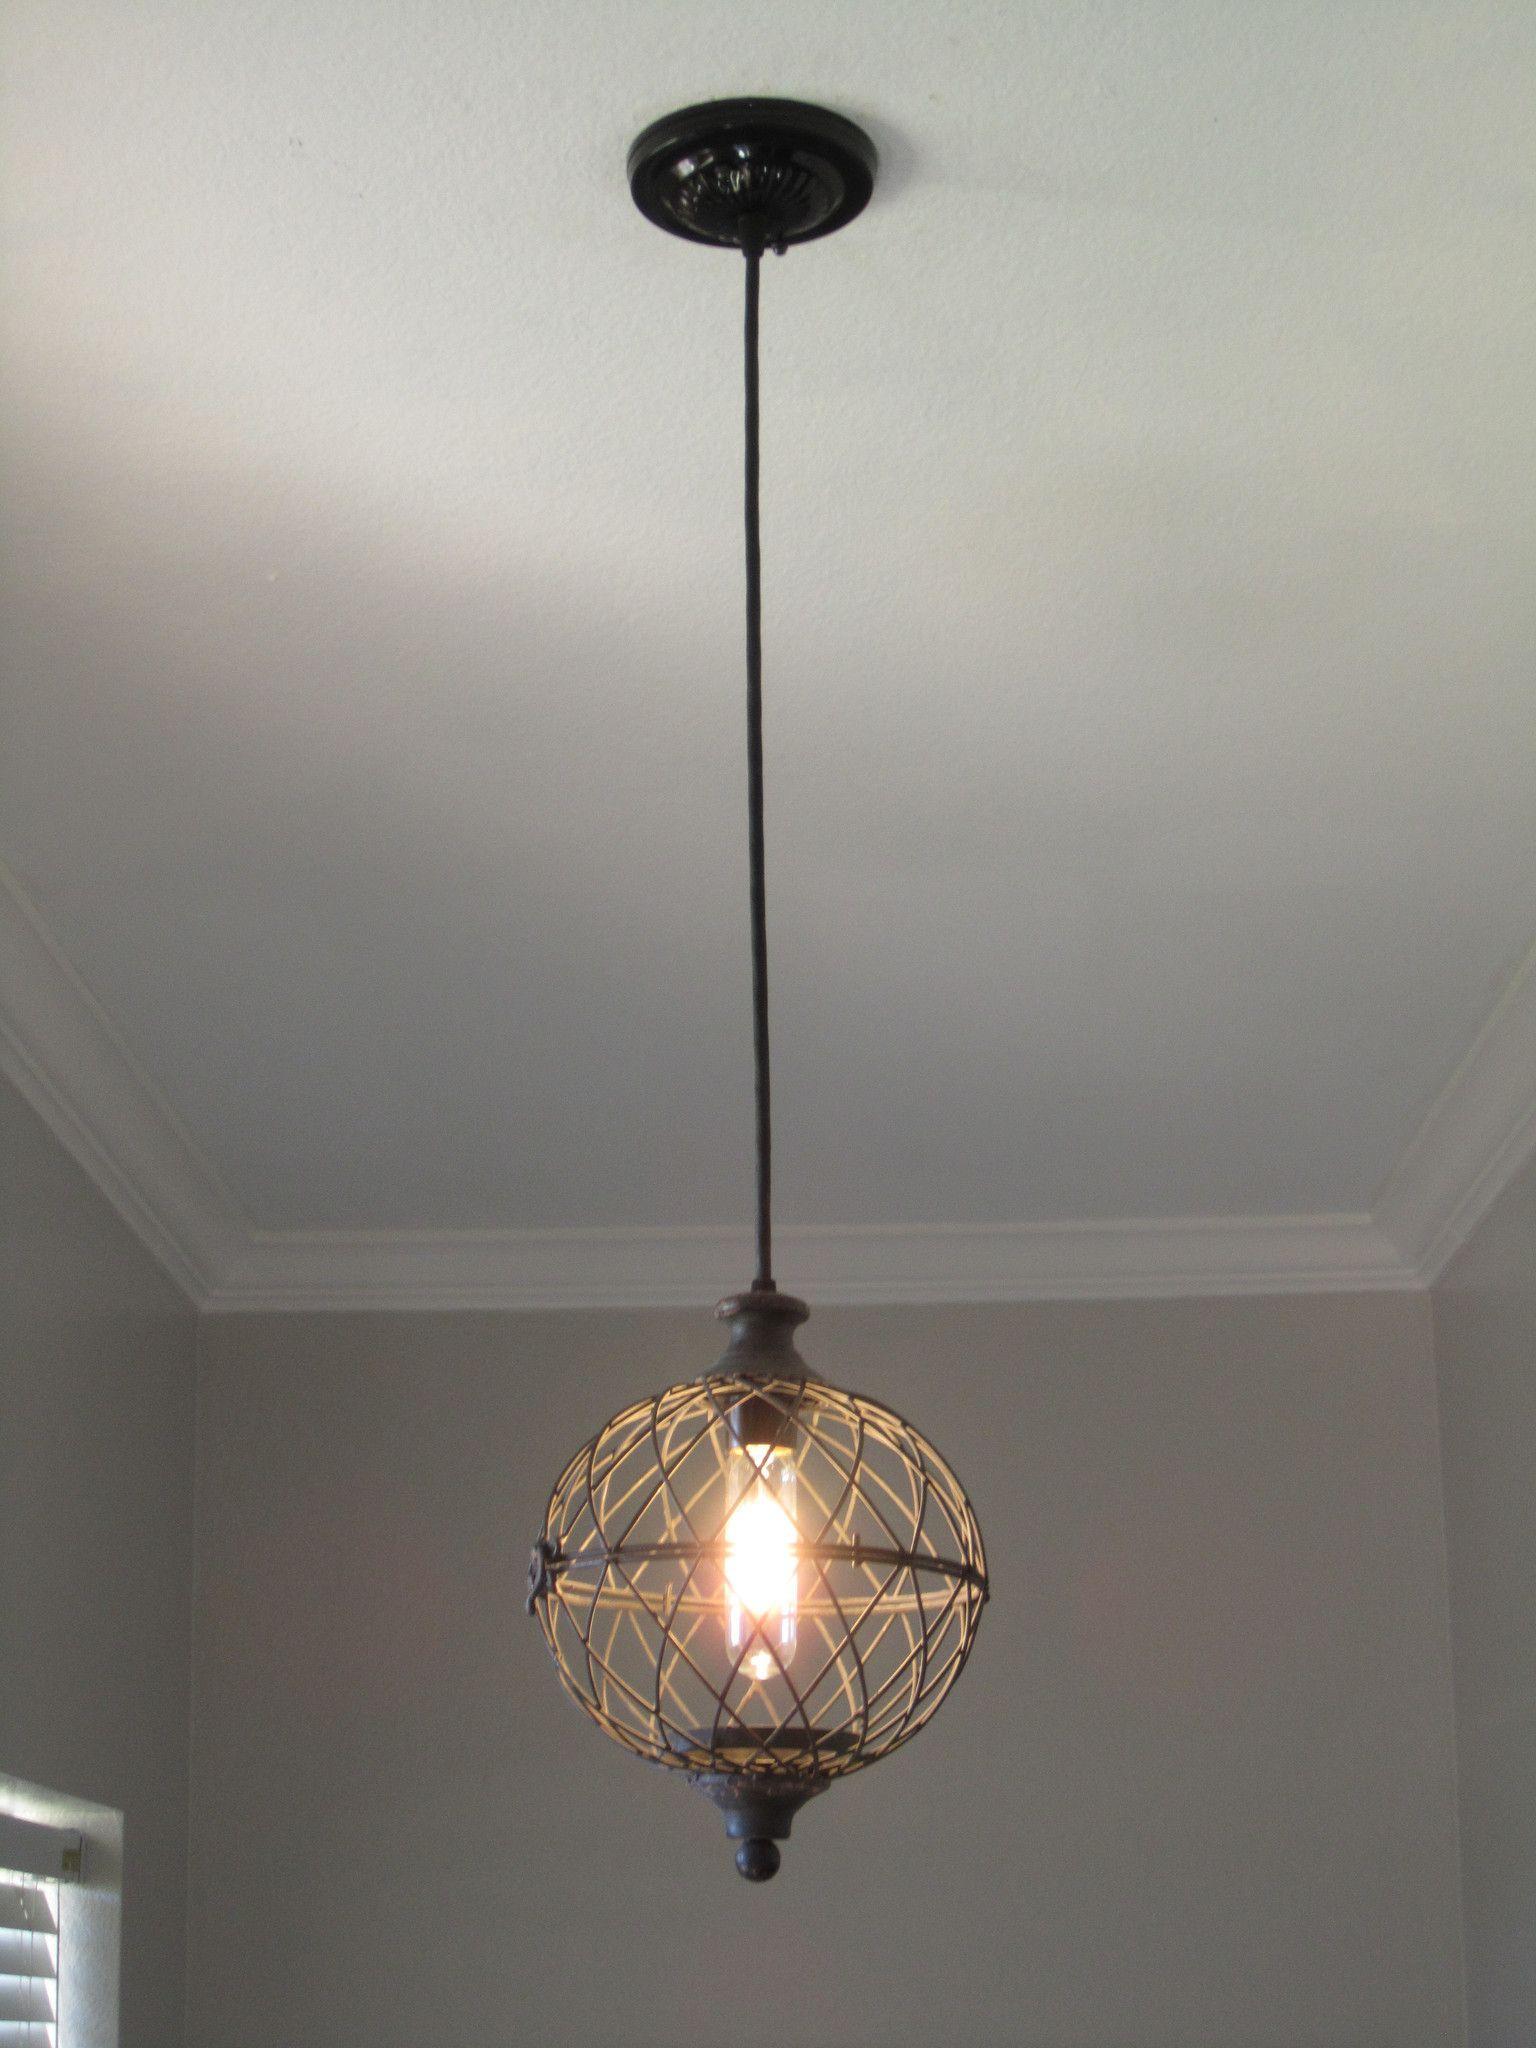 industrial kitchen lighting pendants. Rustic Small Metal Globe Pendant Light - Distressed, Lighting, Unique , Farmhouse Style, Vintage, Industrial Light, Kitchen Lighting Pendants C